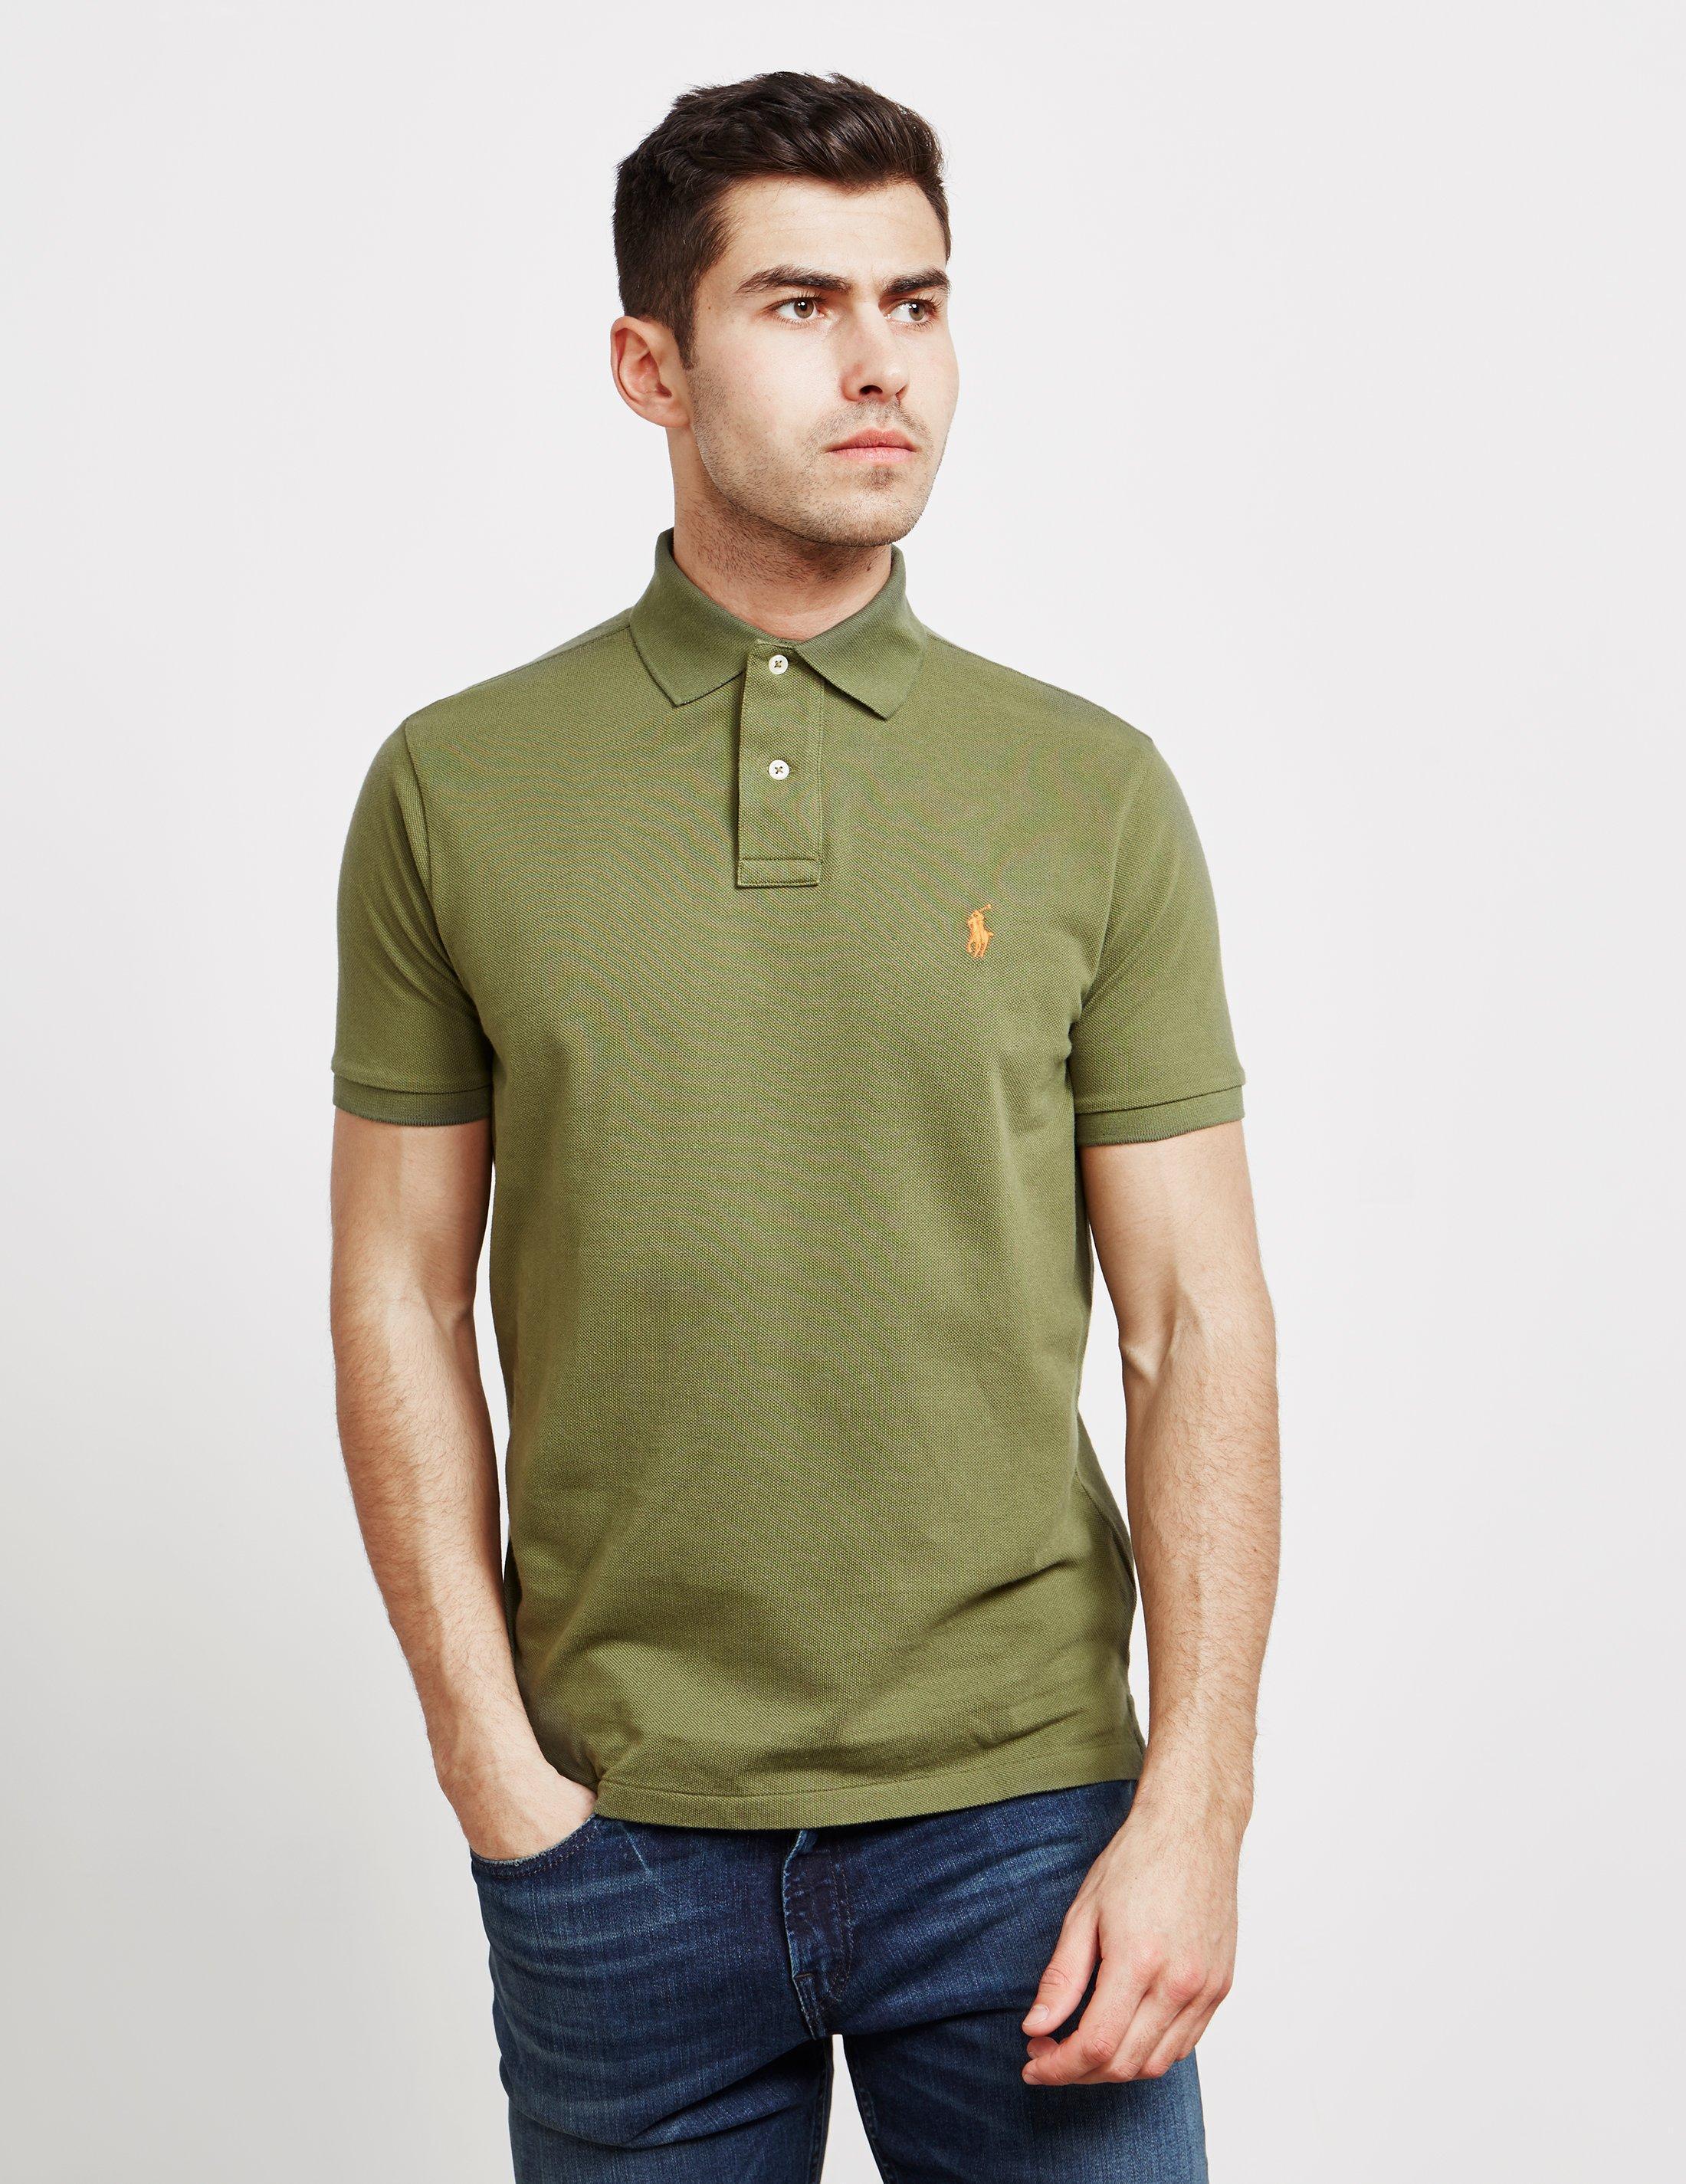 a9892ffc Polo Ralph Lauren Mens Mesh Short Sleeve Polo Shirt Green in Green ...